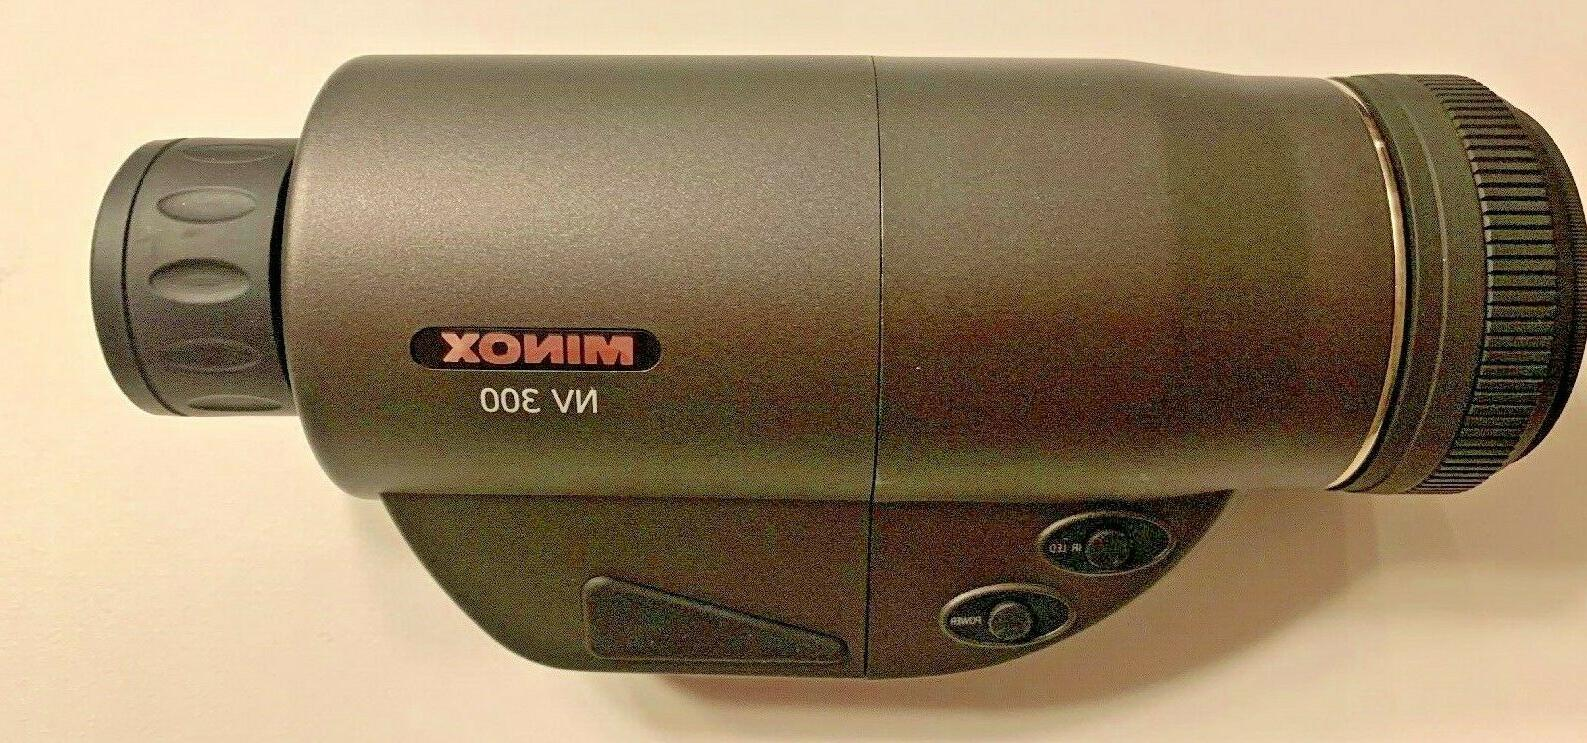 Minox 300, Compact Pocket